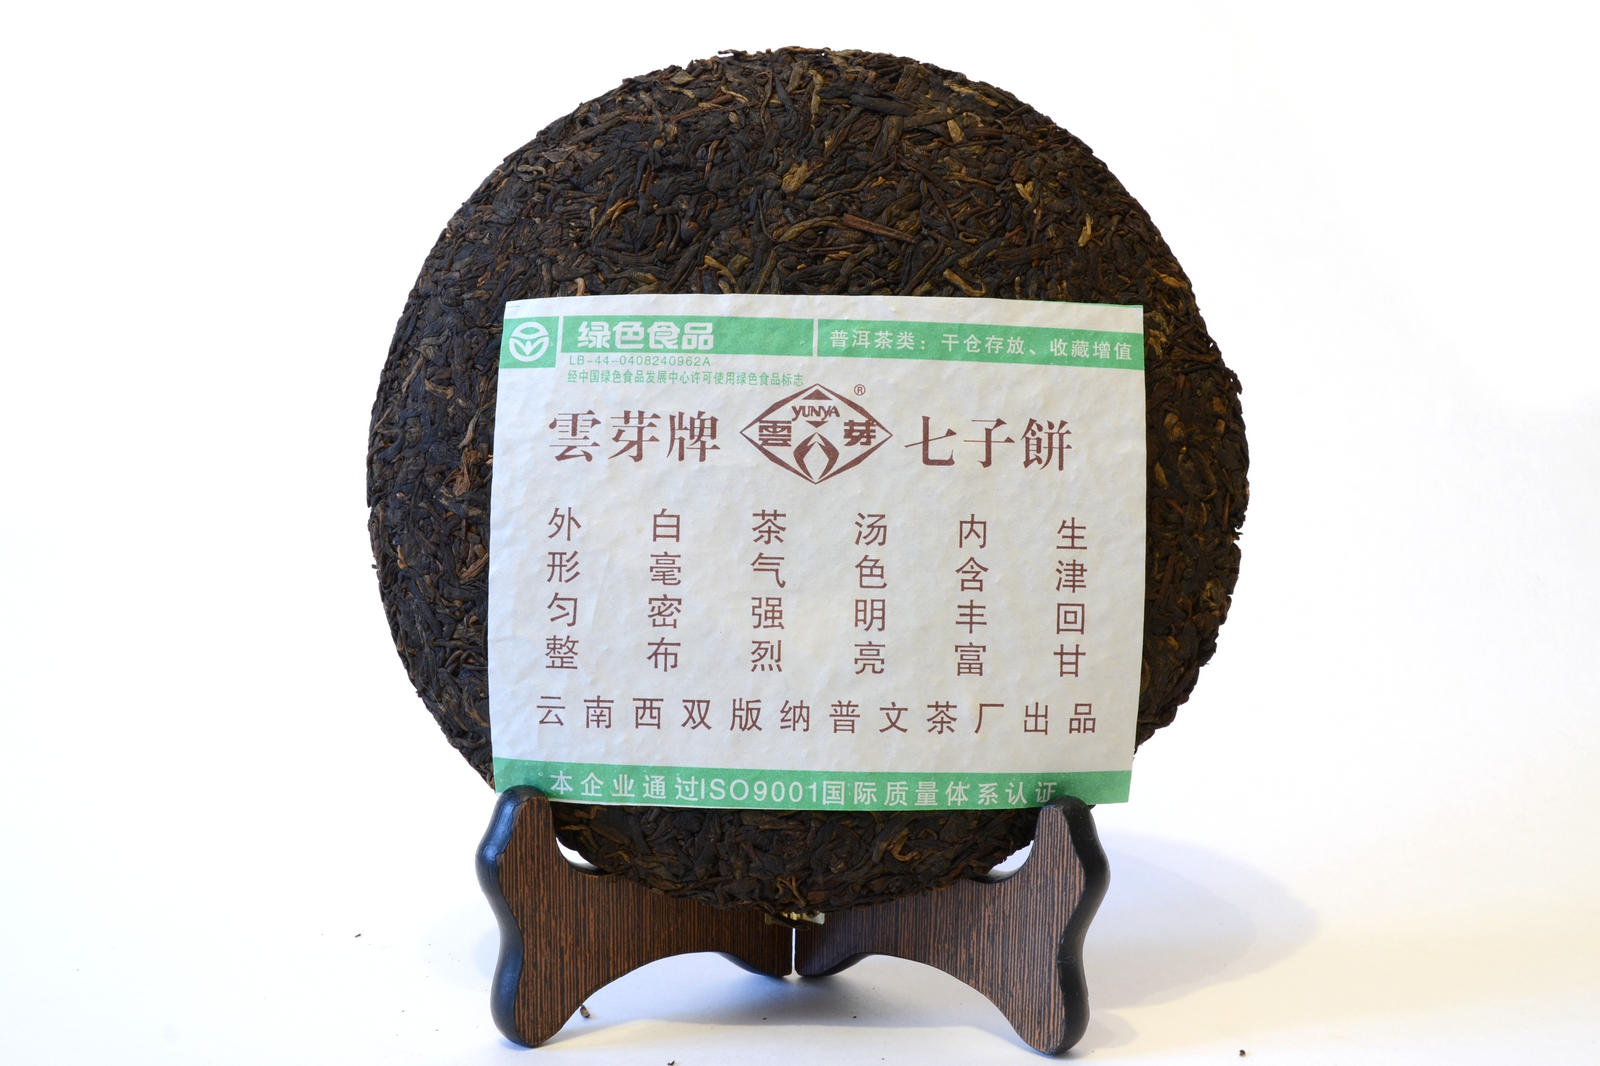 отзывы пурпурный чай чанг-шу отзывы